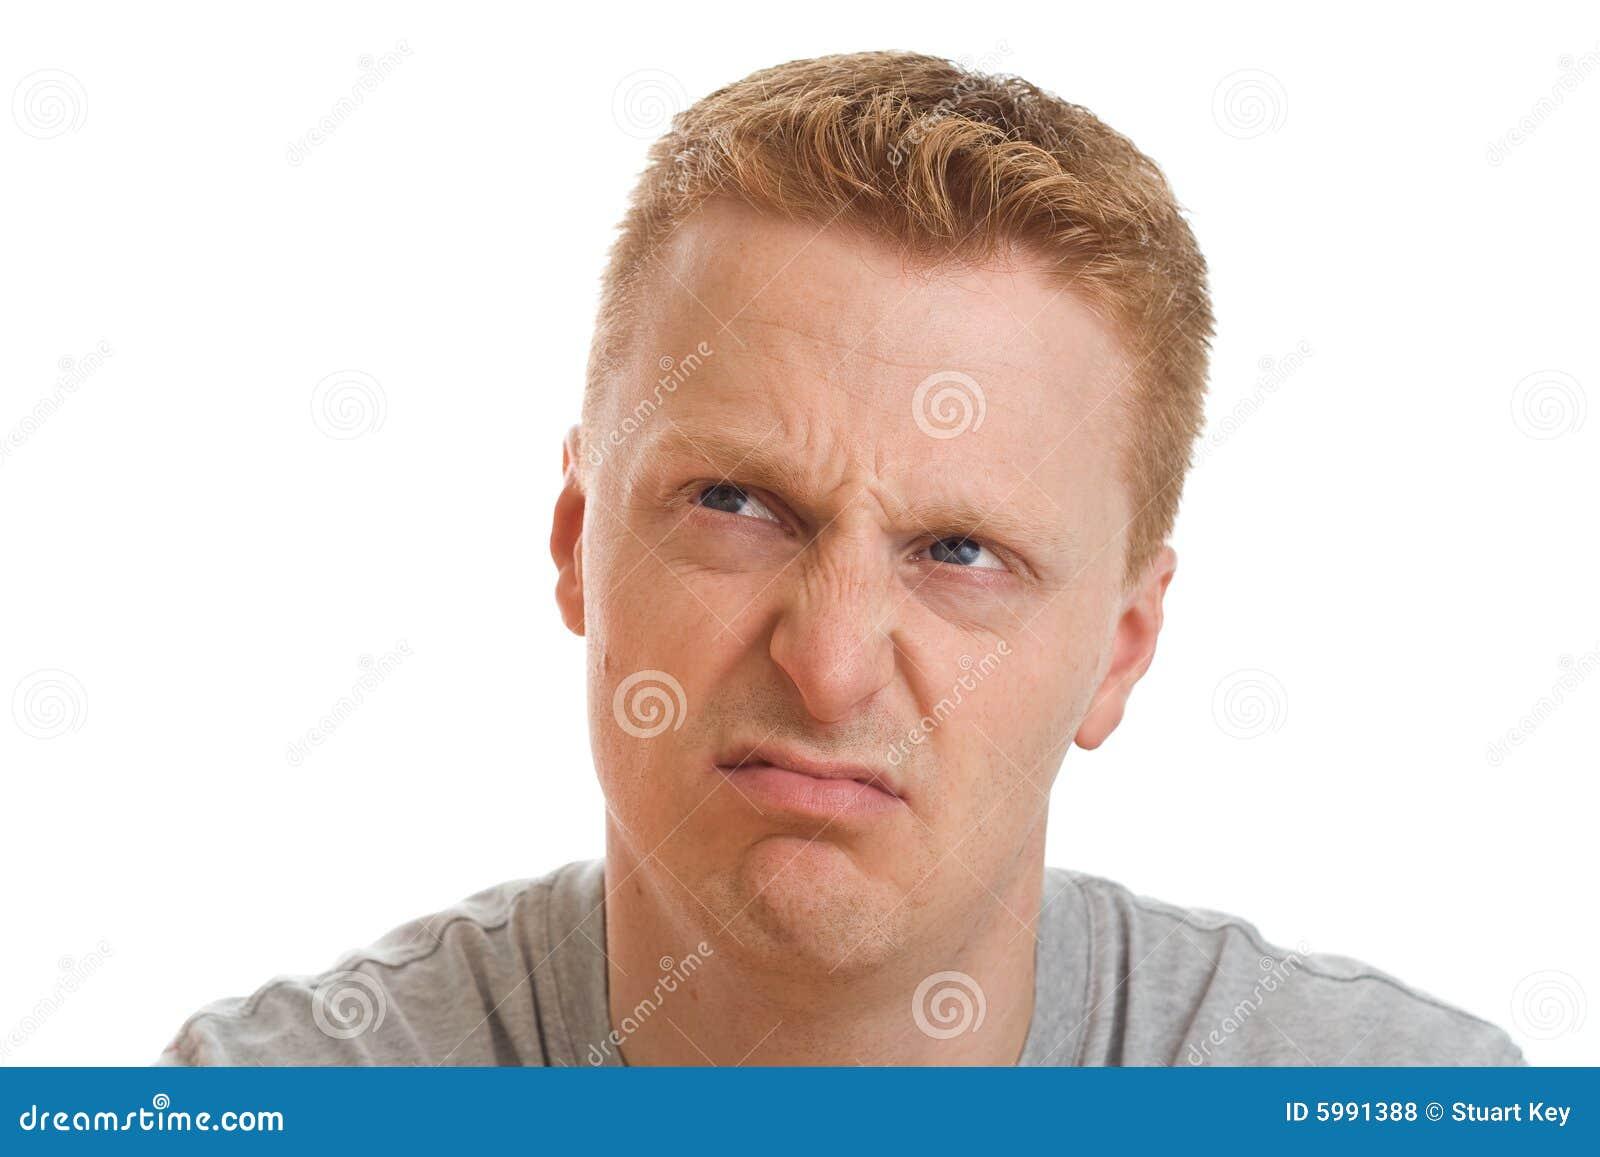 Disgruntled man